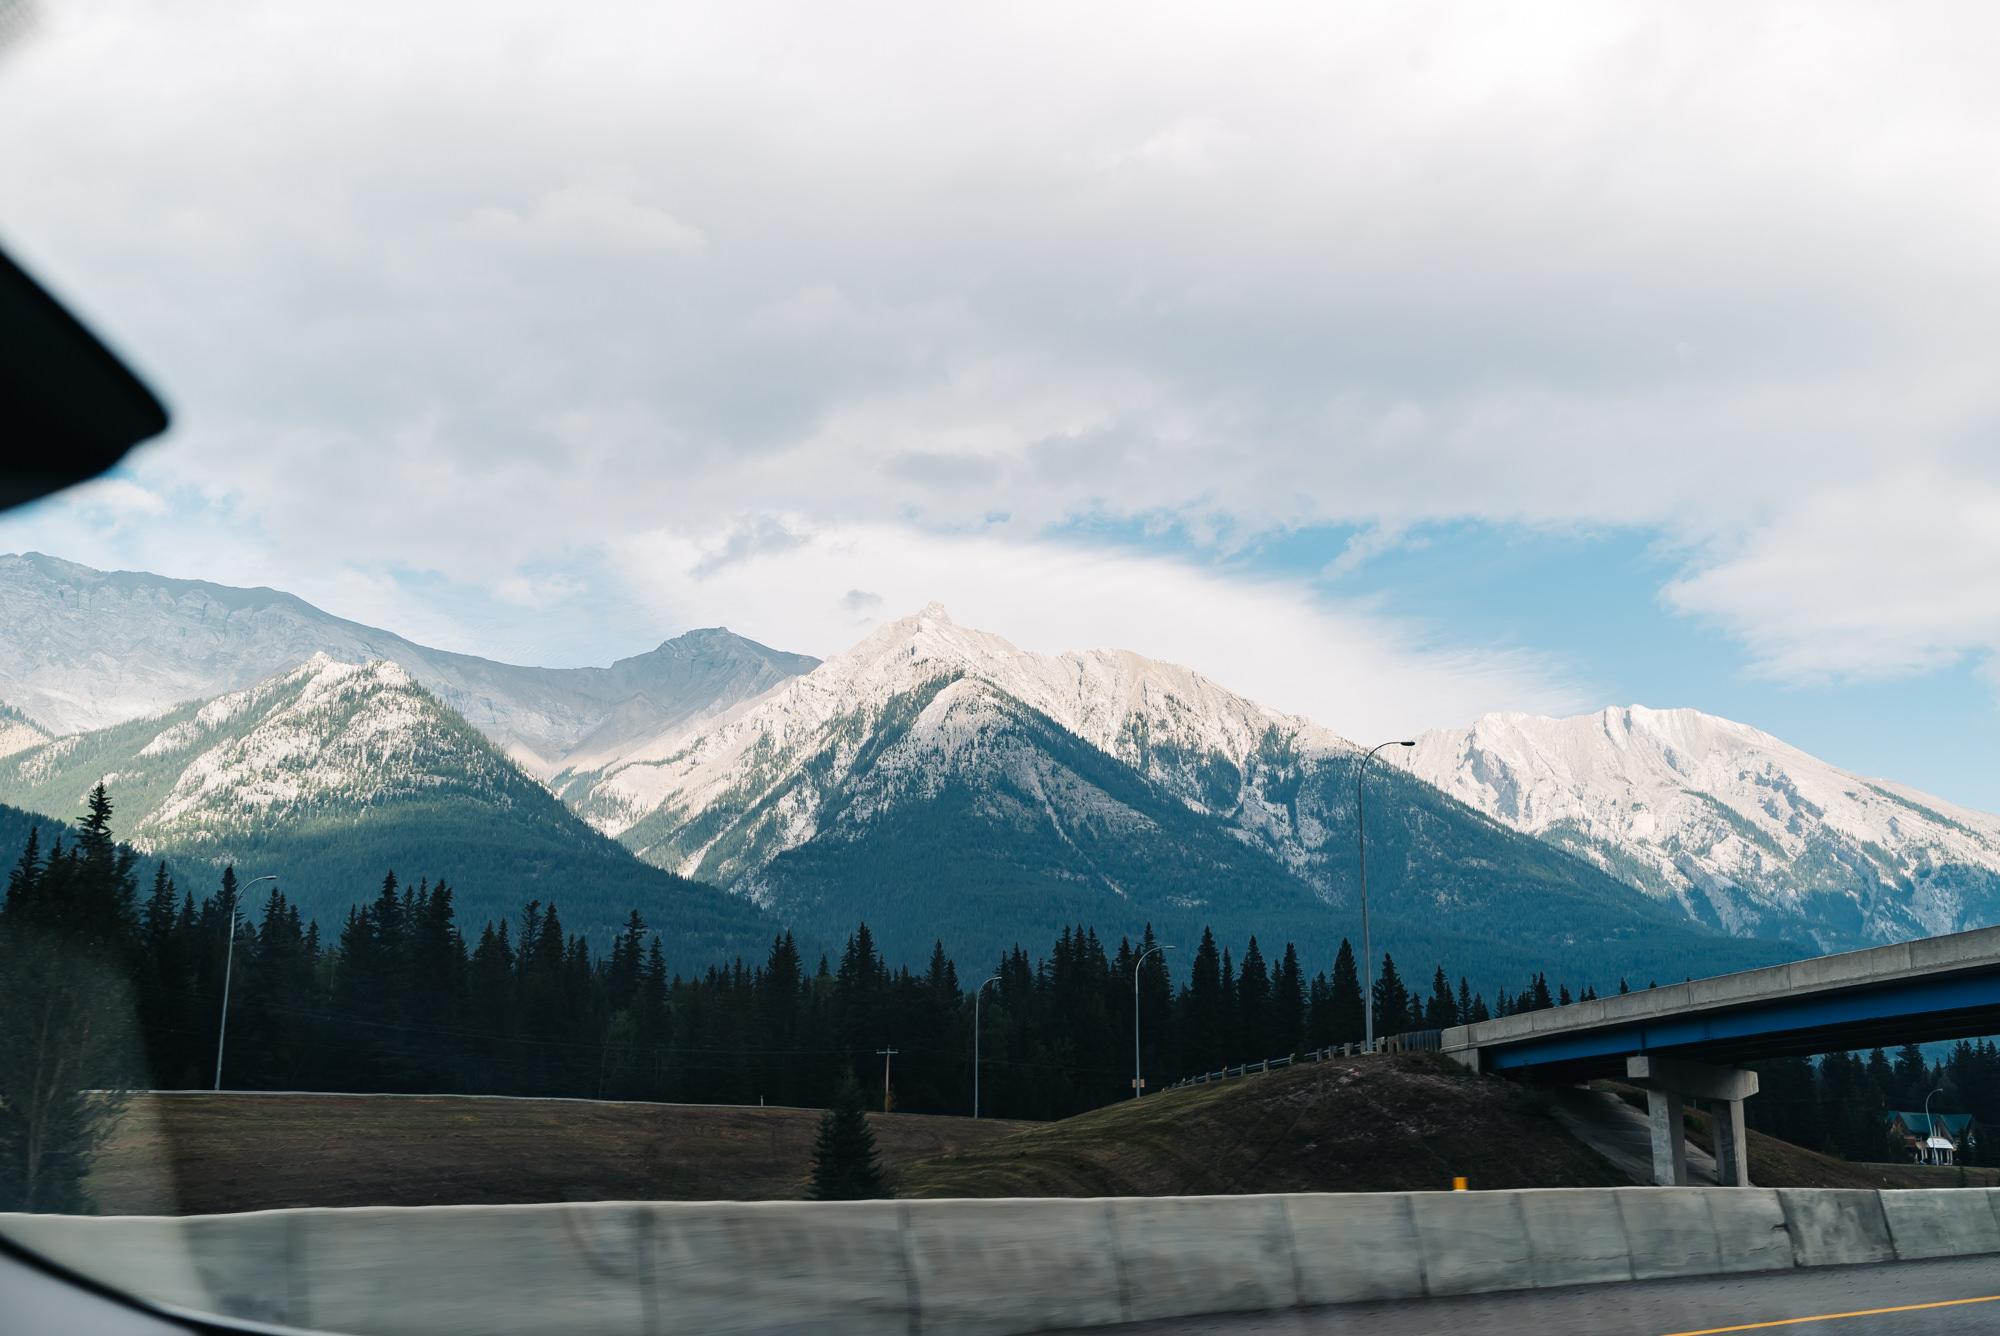 Banff National Park Scenic Drive